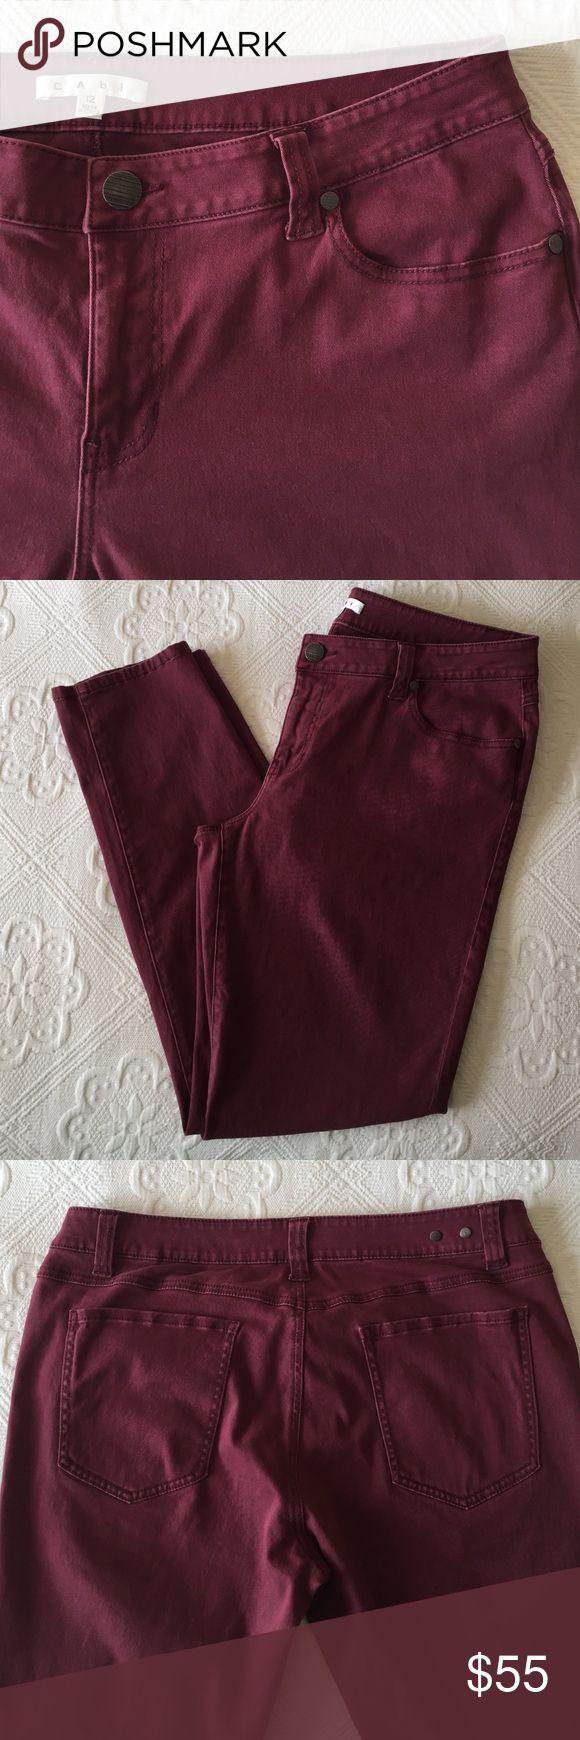 CAbi Bordeaux Wash Stretchy Skinny Jean Style# 919 CAbi Bordeaux Wash - Stretchy Skinny Jean - Merlot / Burgundy - Style # 919 CAbi Pants Skinny